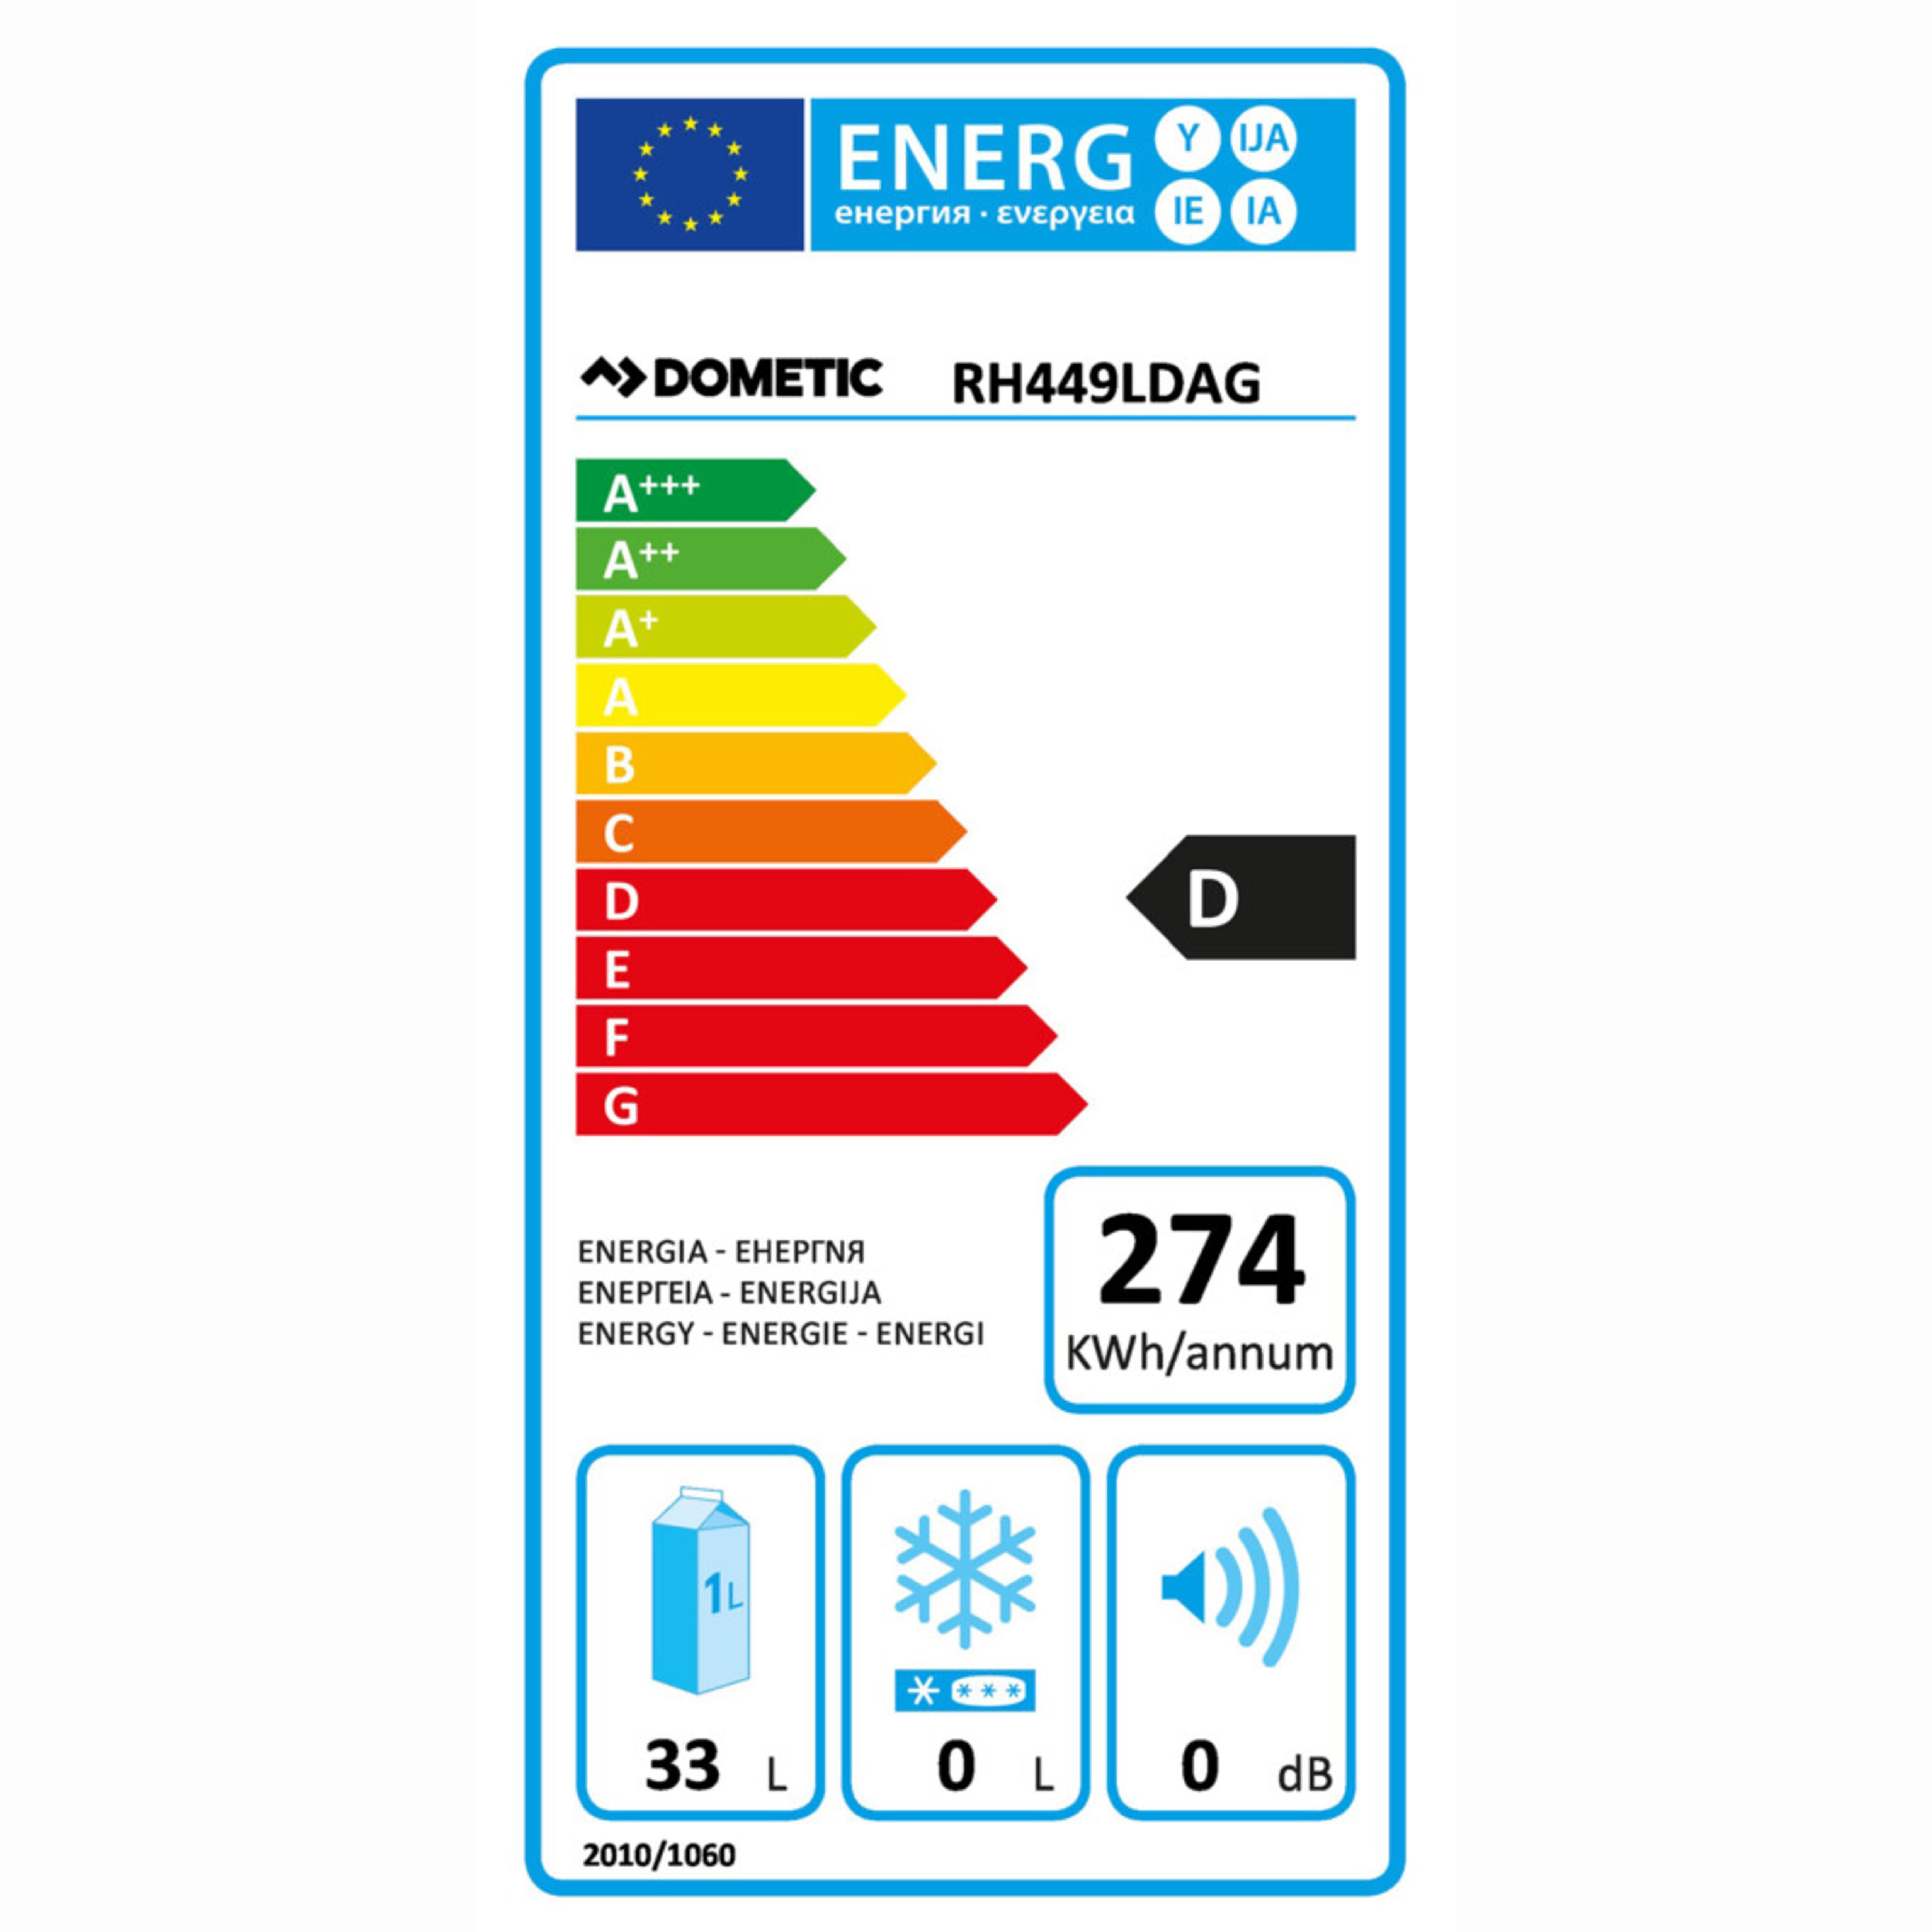 Dometic RH 449 LDAG Energy label